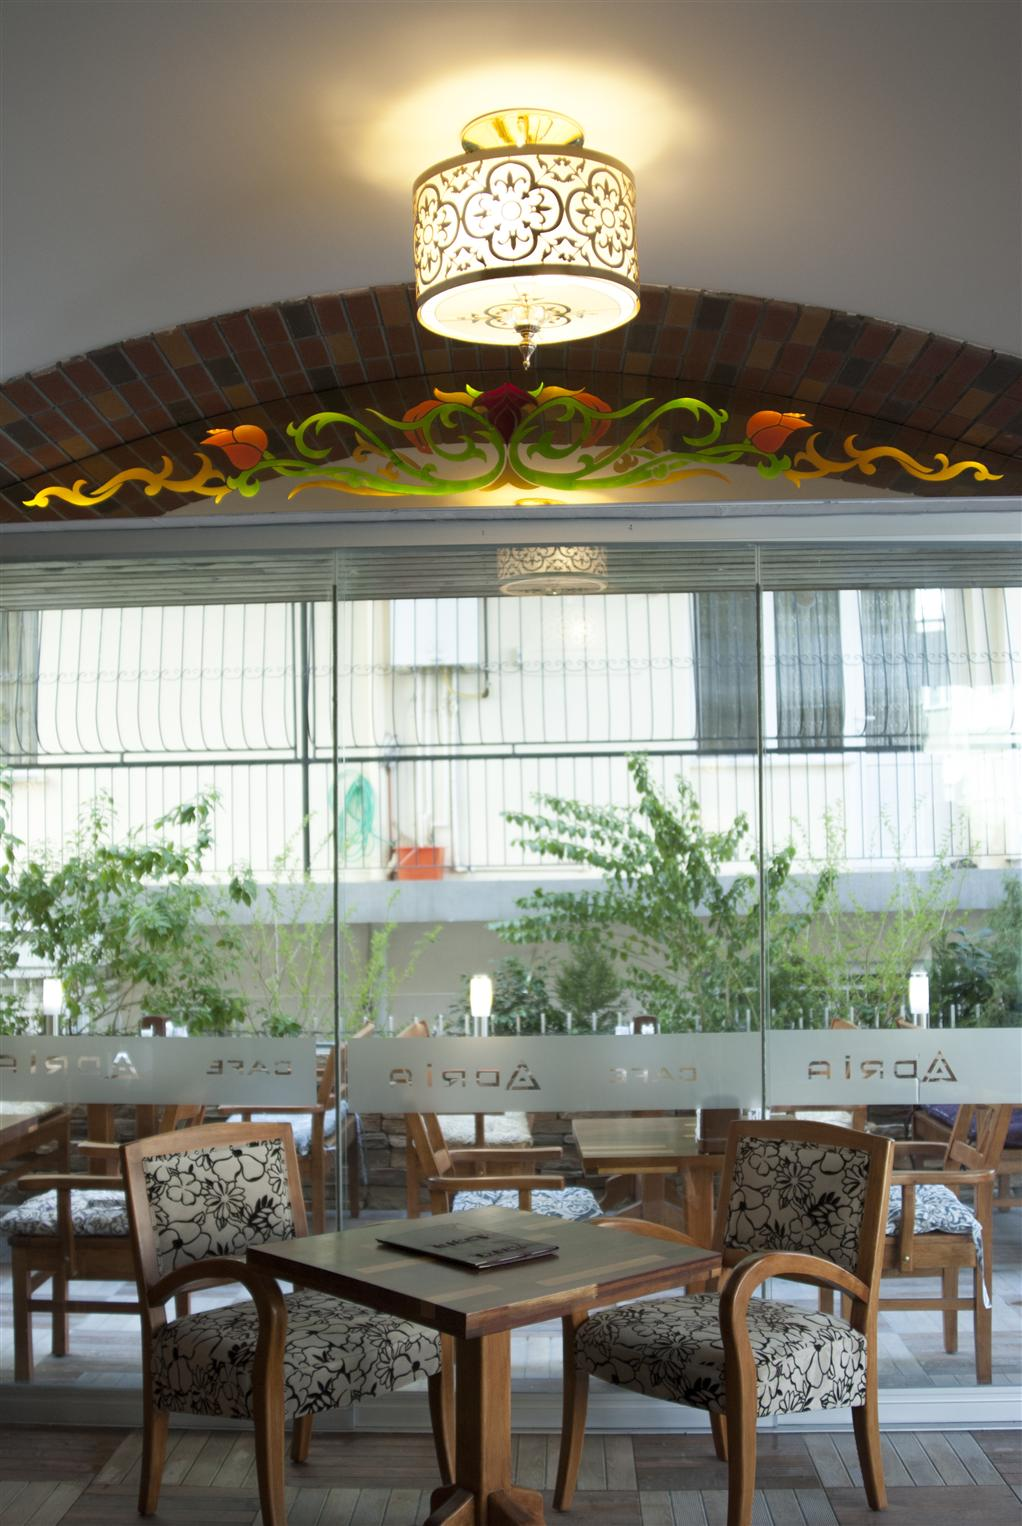 adria-cafe2015921173559713.jpg izmir vitray çalışması